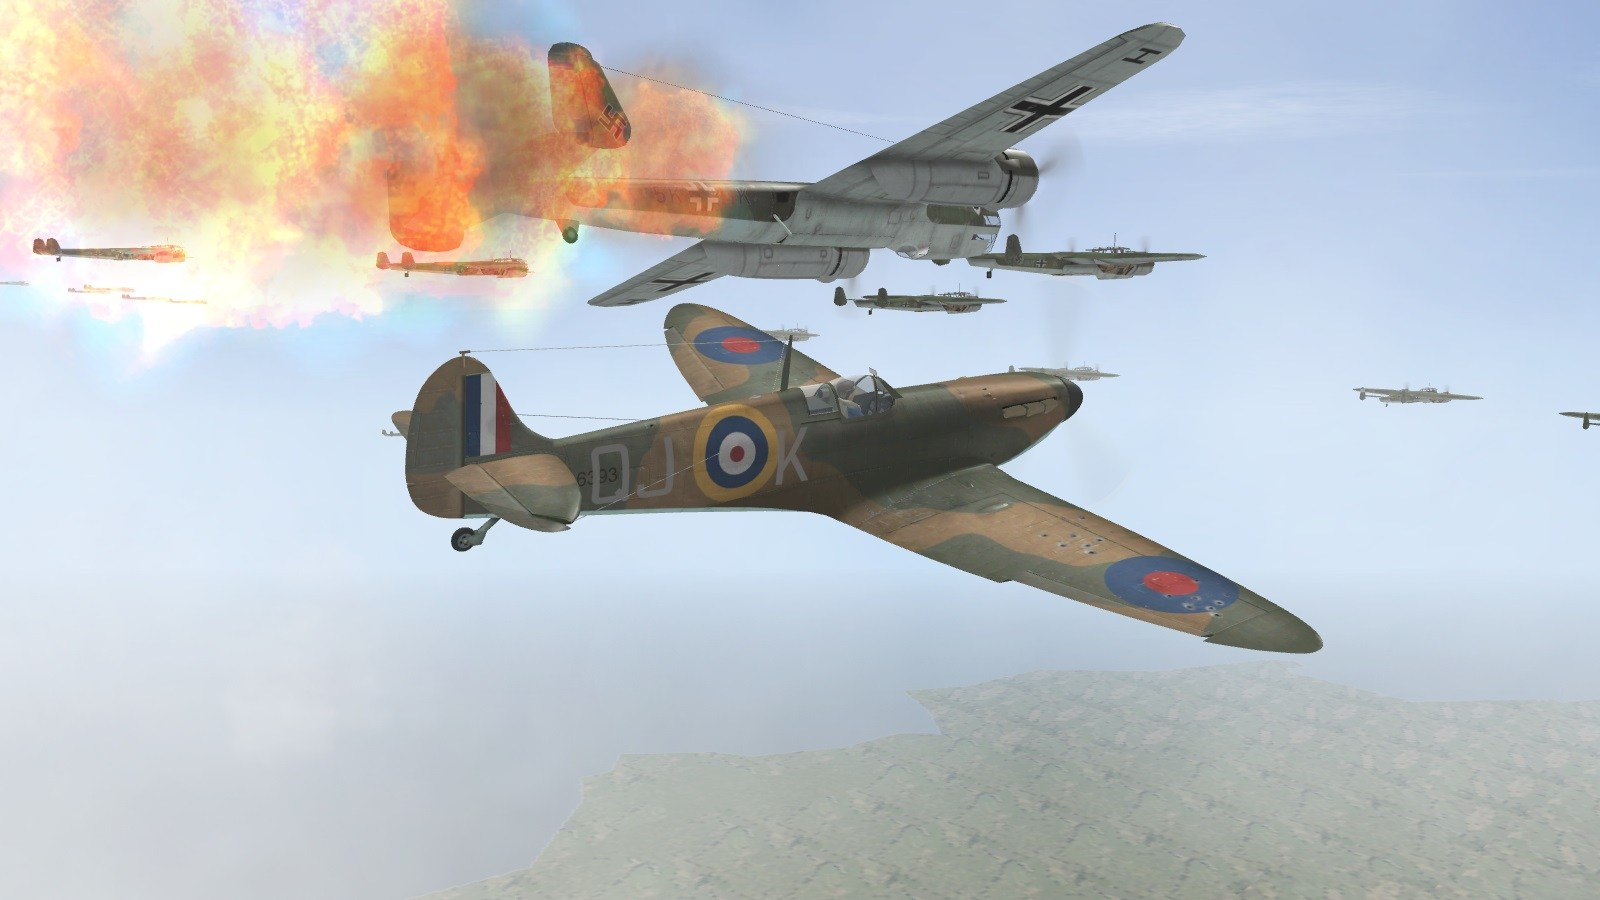 Battle of Britain II - 23 July 1940 - 92 Squadron intercepts Hostile 202